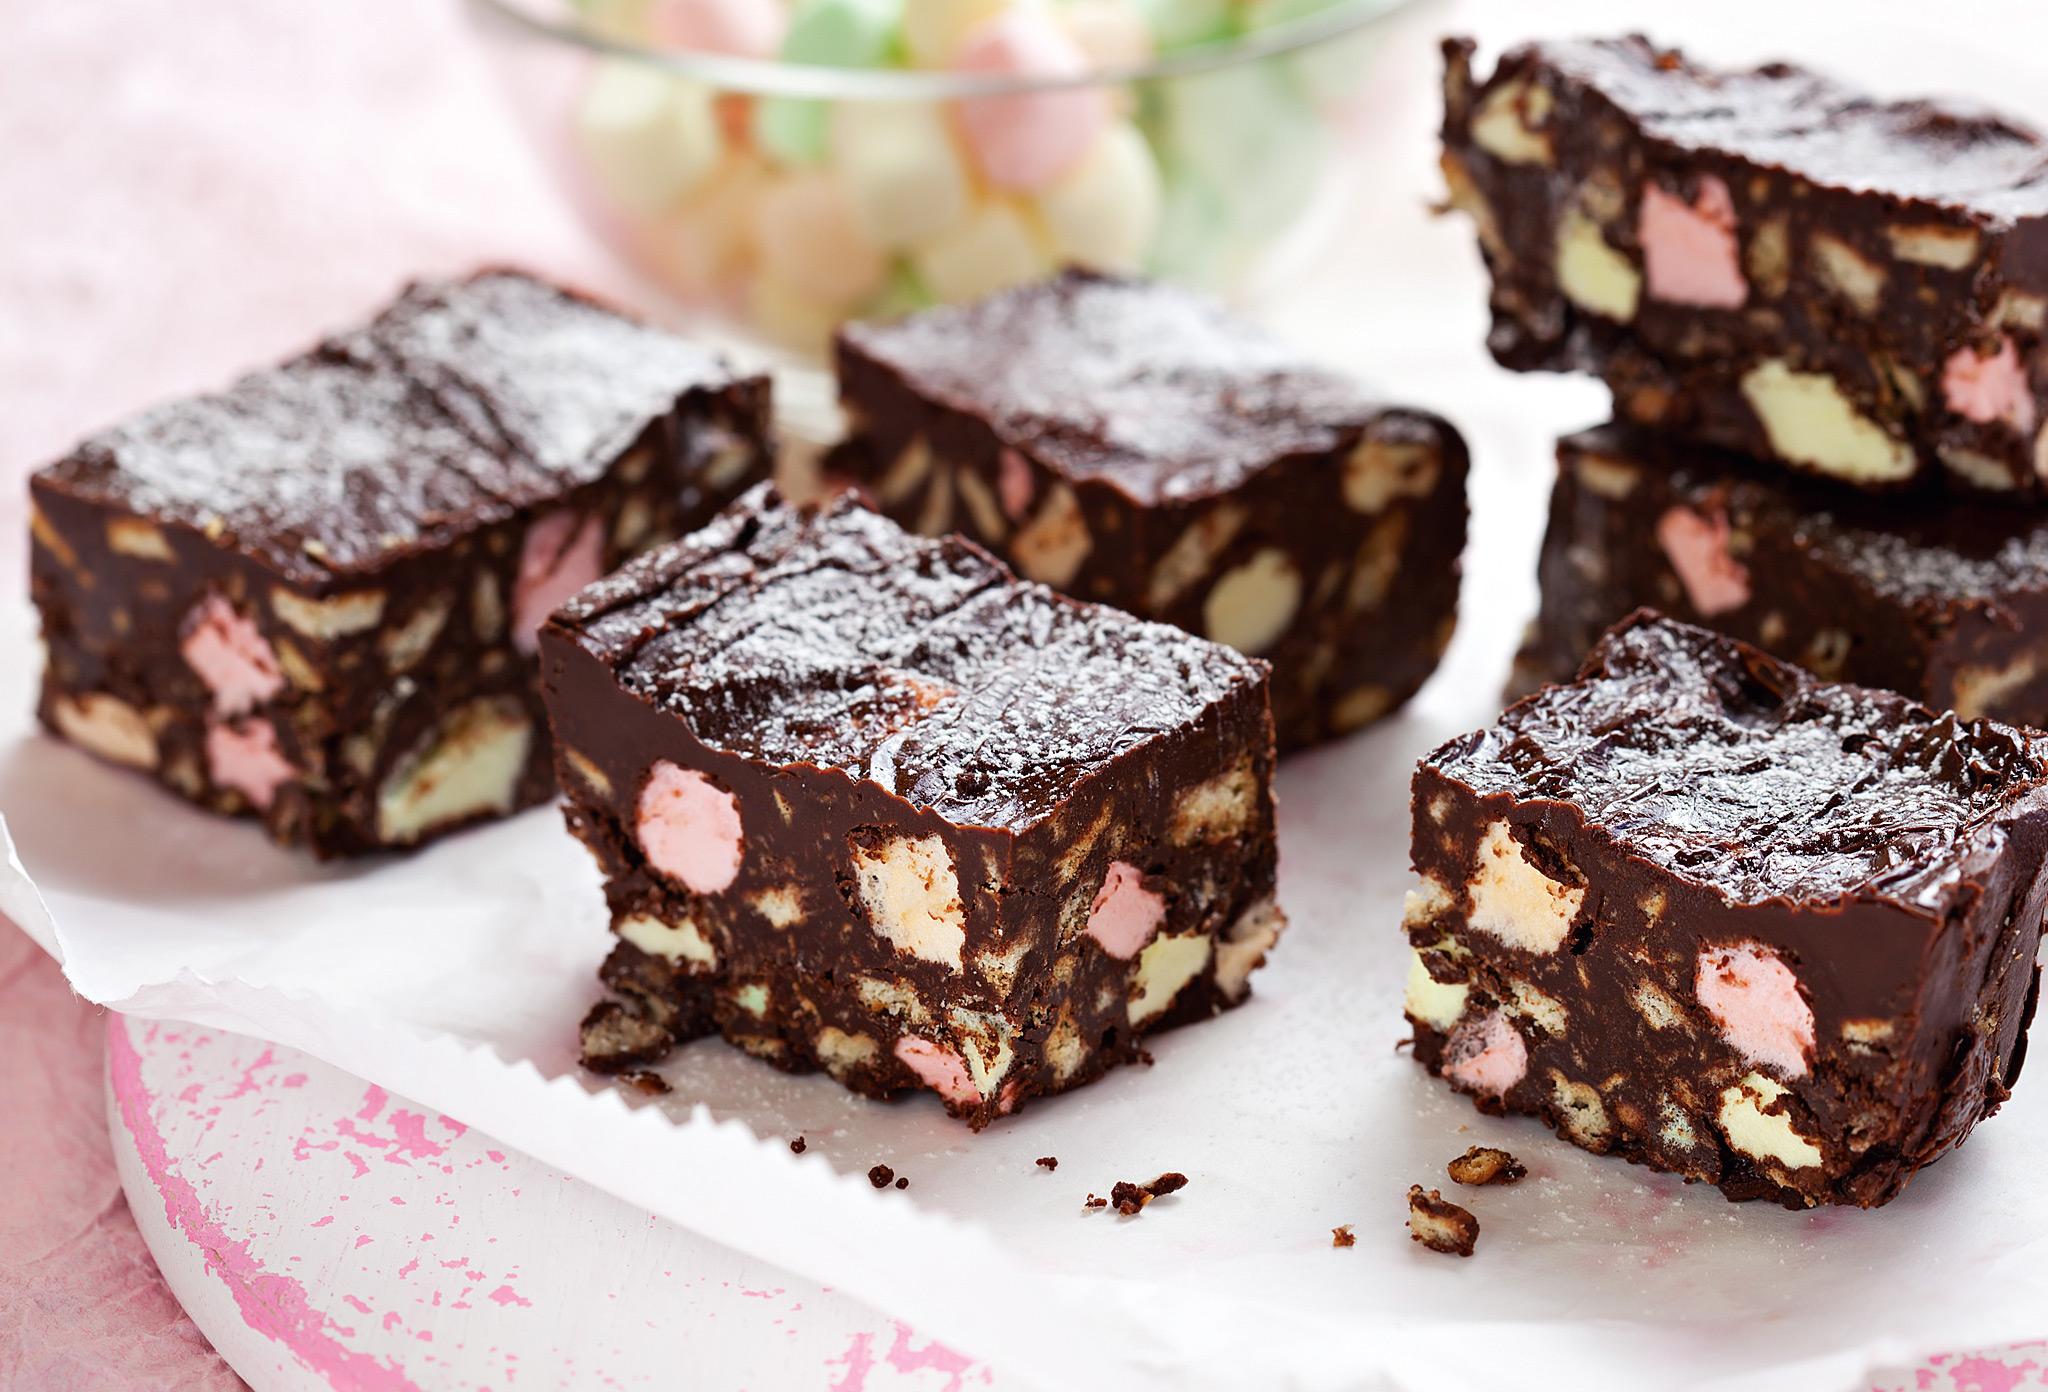 Шоколадный батончик с маршмеллоу